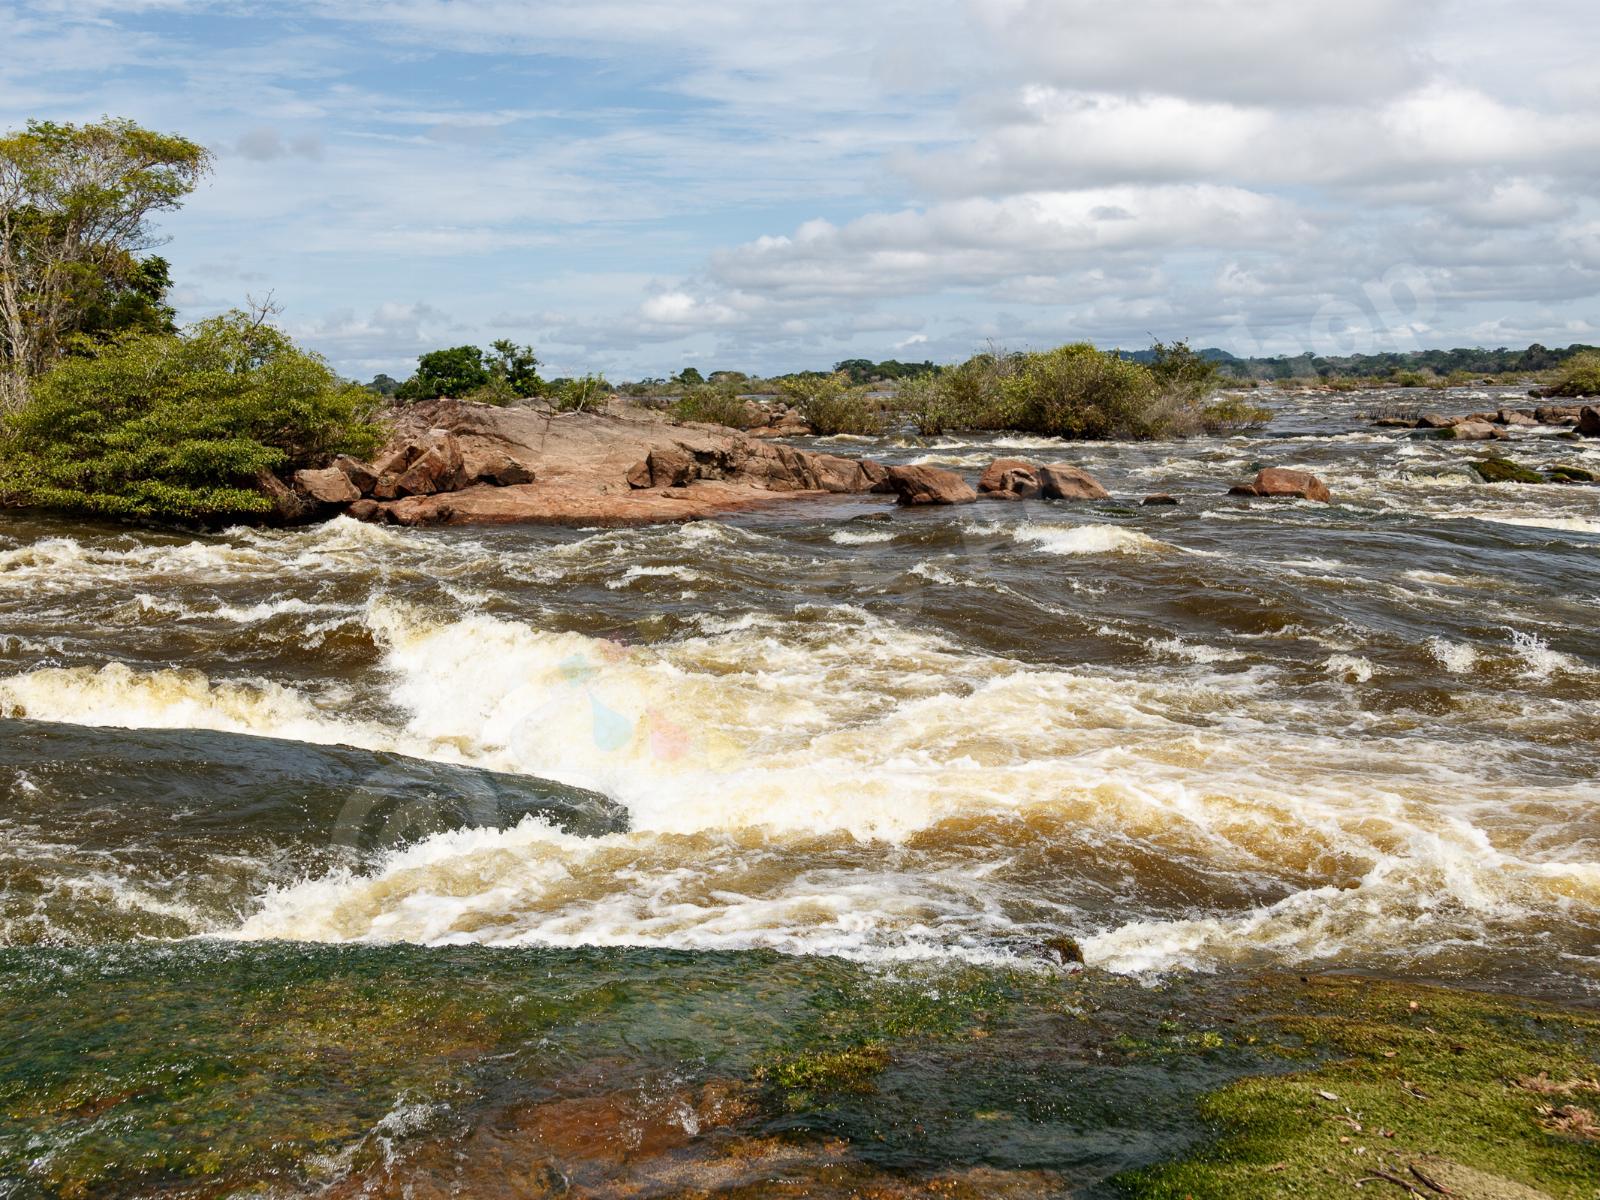 rio iriri cachoeira grande andreas tanke 0201 7